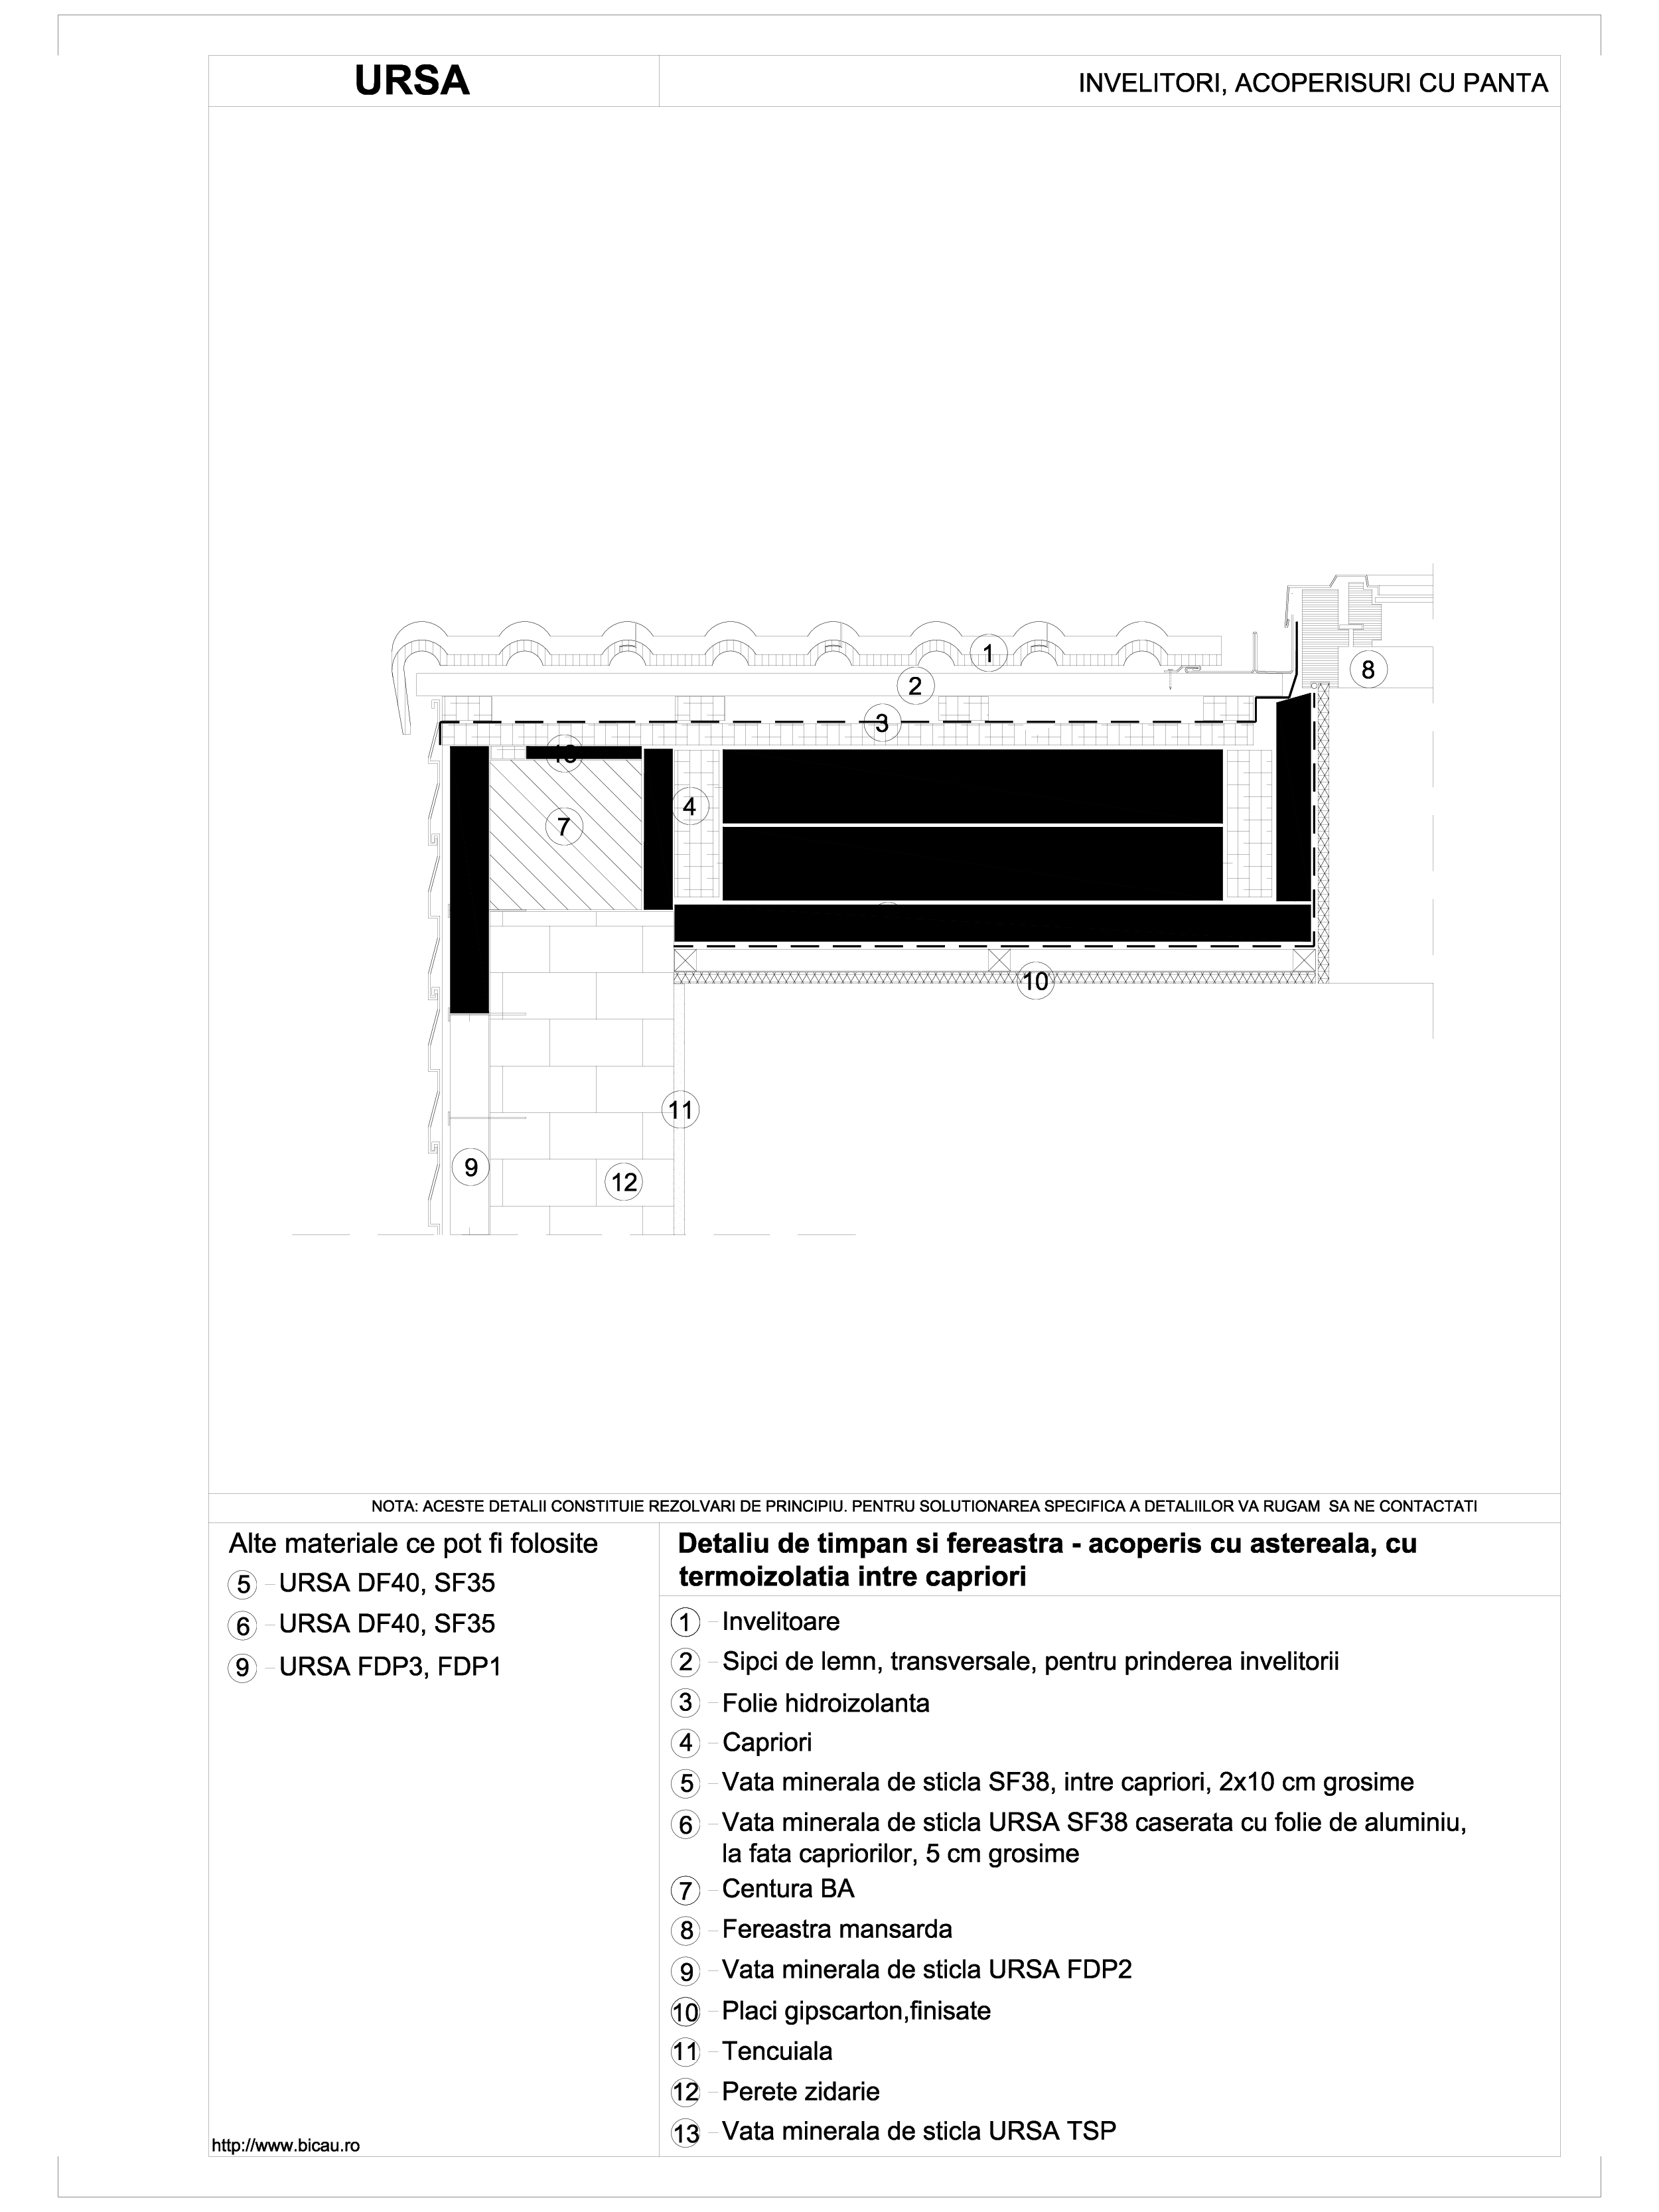 Detaliu de timpan si fereastra - acoperis cu astereala, cu termoizolatia intre capriori URSA Vata minerala pentru acoperisuri si mansarde URSA ROMANIA   - Pagina 1